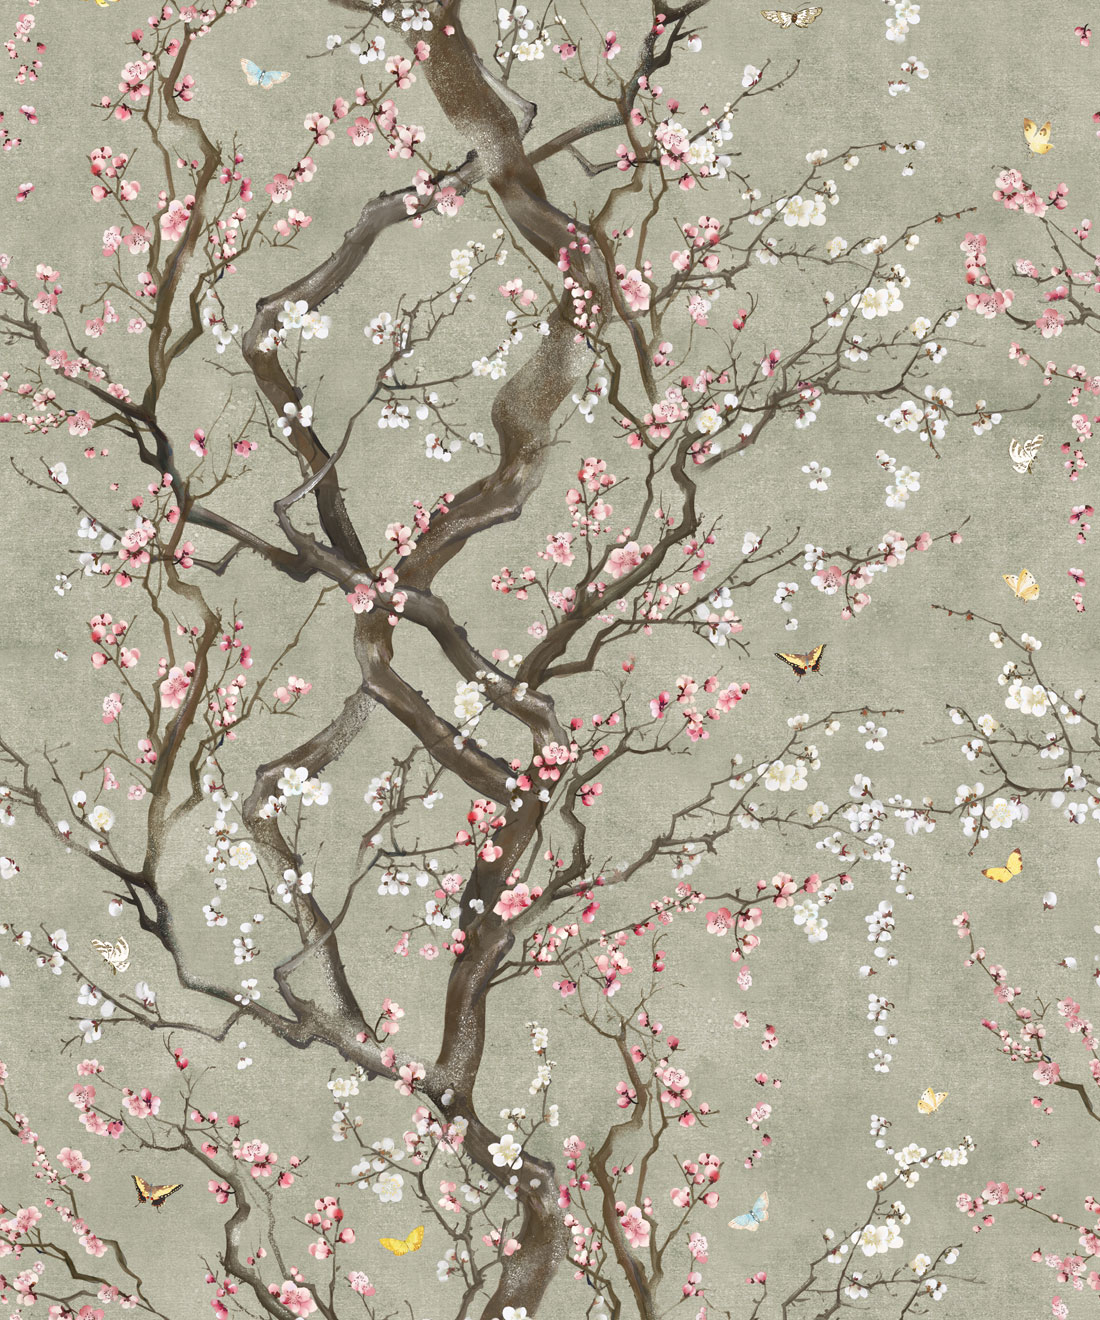 Japanese Floral Wallpaper Plum Blossom Kingdom Home Milton King